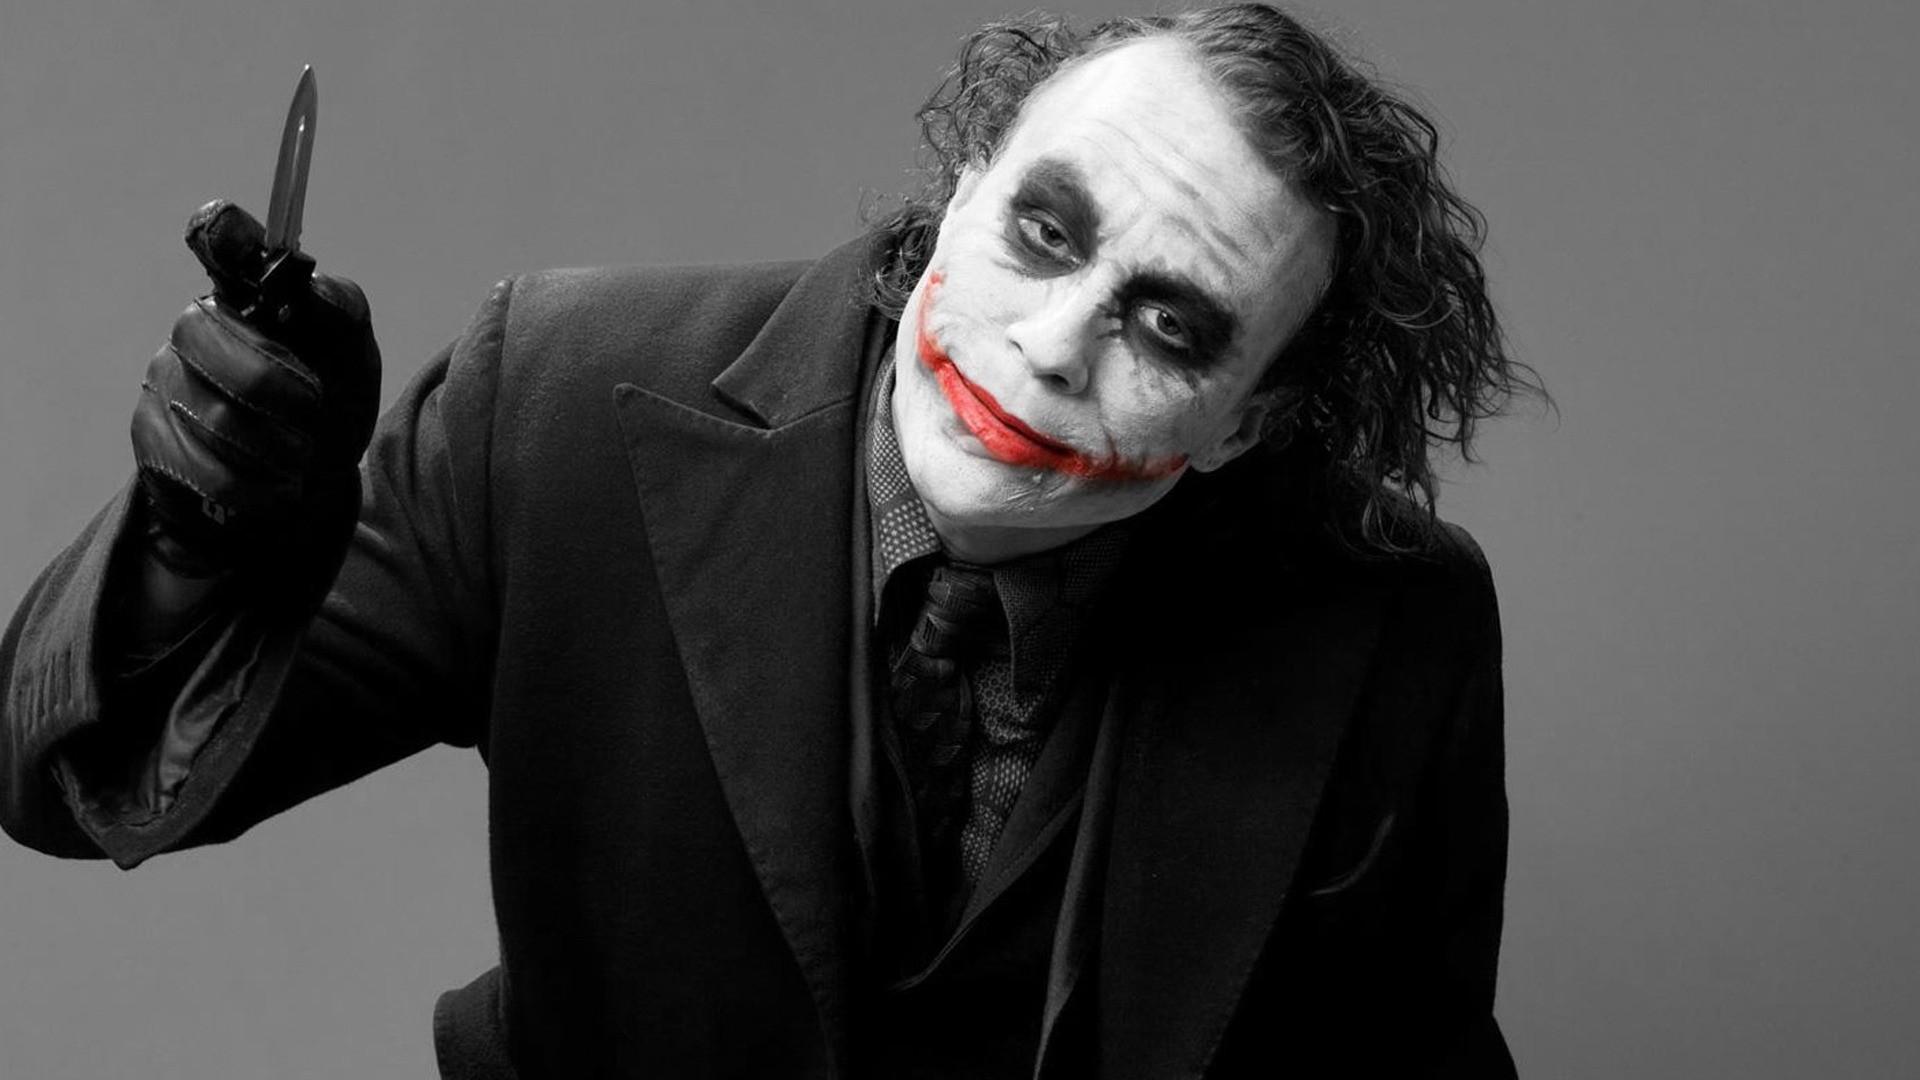 Photography Batman Joker DC Comics Black And Red Heath Ledger